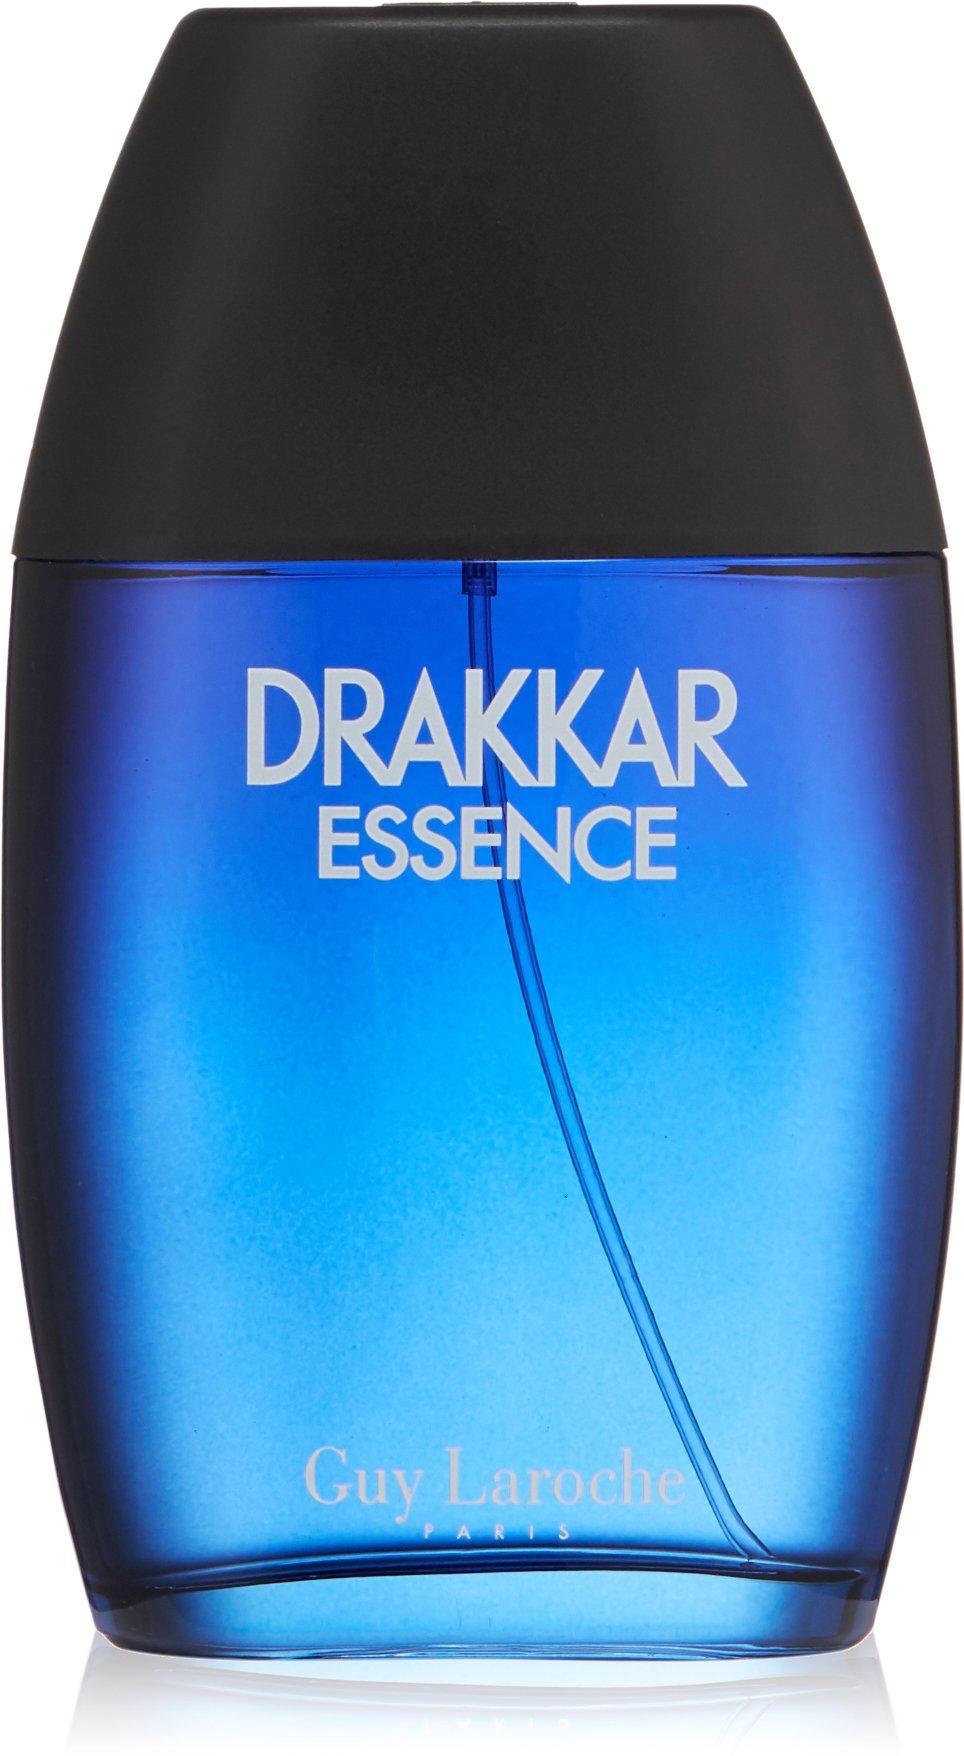 Guy Laroche Drakkar Essence Eau de Toilette Spray, 3.4 Fl Oz